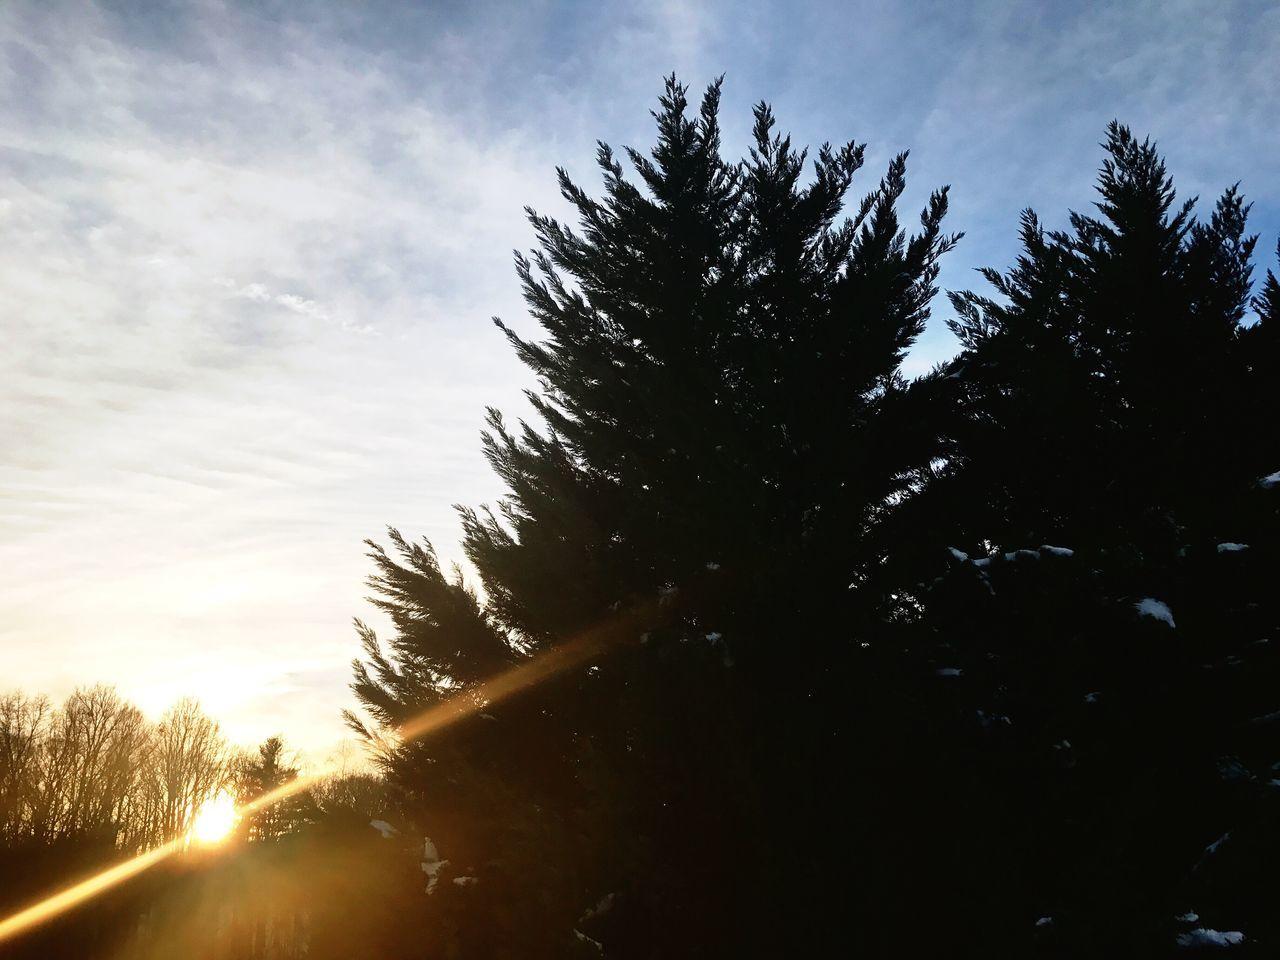 Dawsonville, GA. United States. Nature Trees Sun Sunset Sun Glare Sky Day Outside EyeEmNewHere